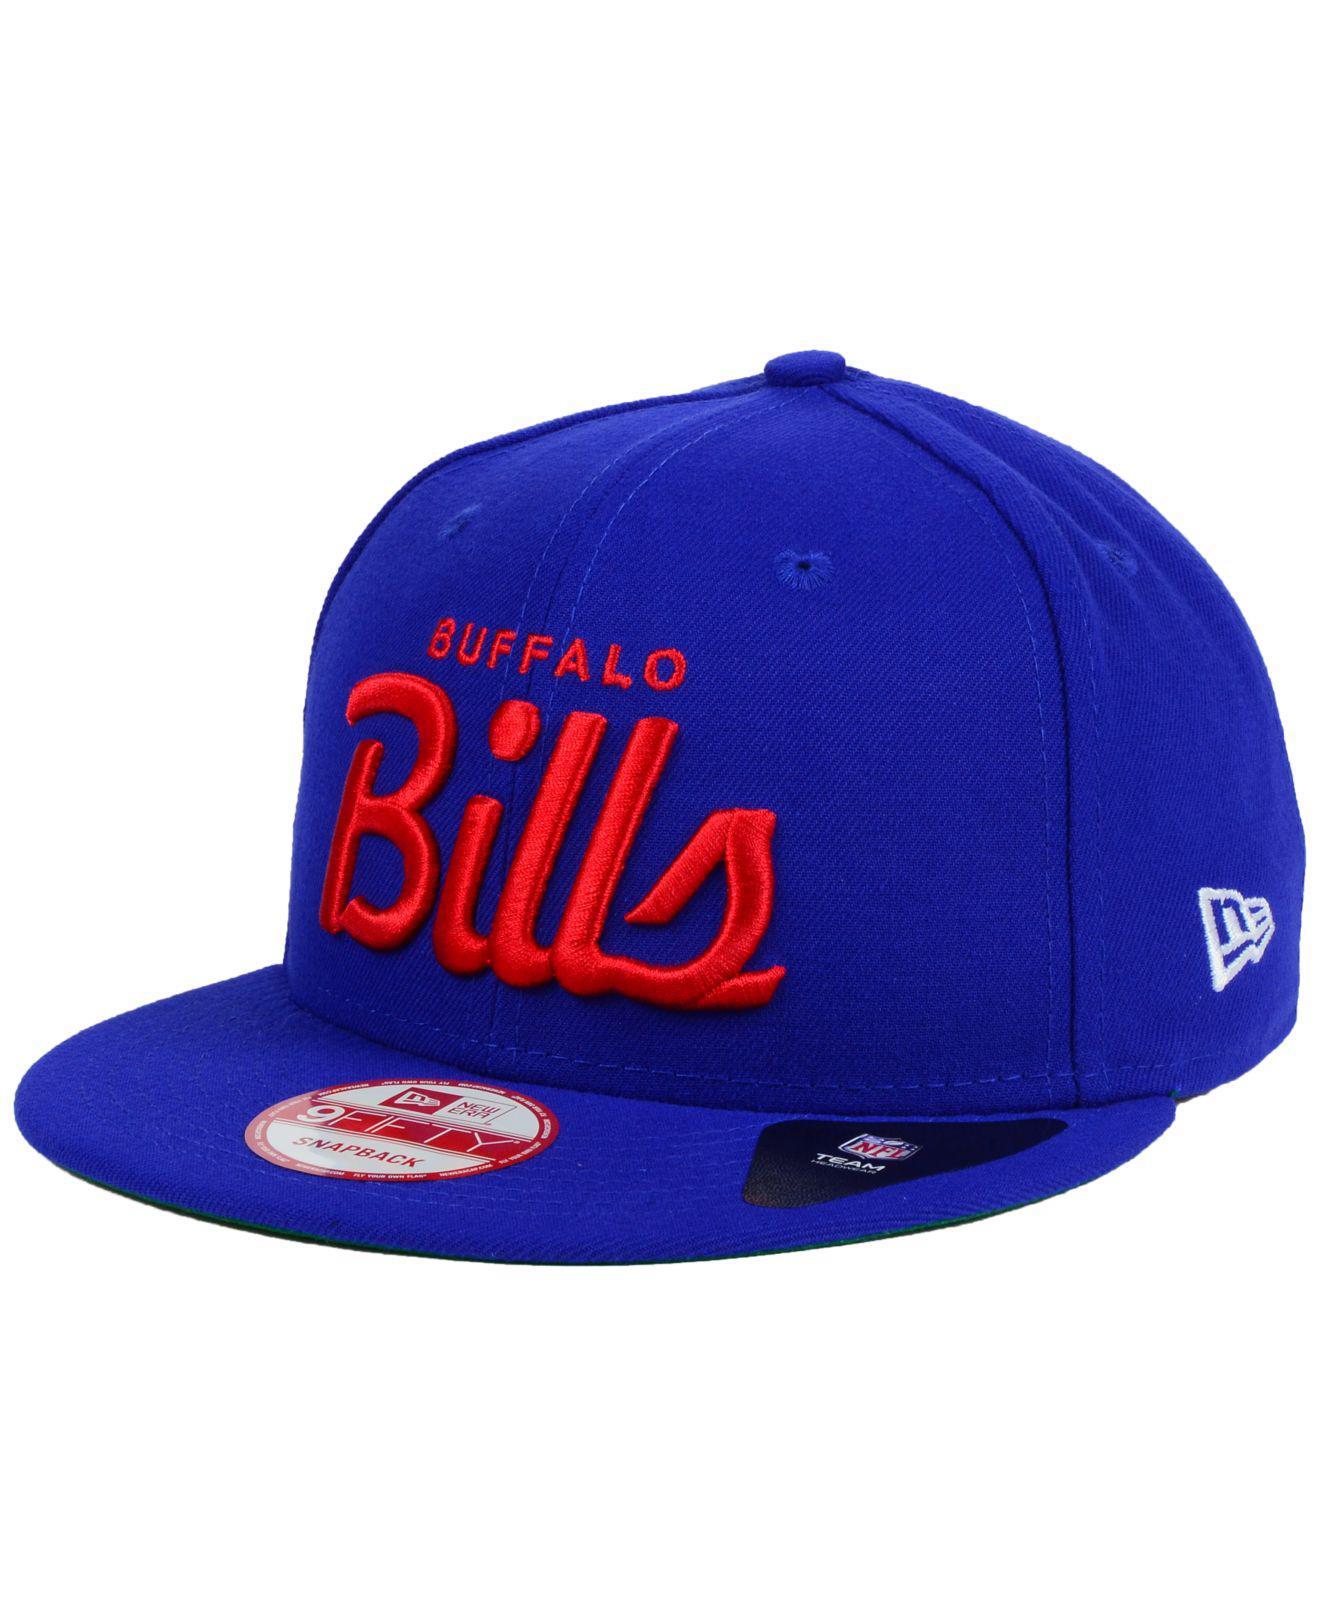 hot new era atlanta braves fitted hats amazon 479f3 916dc 3d216887254